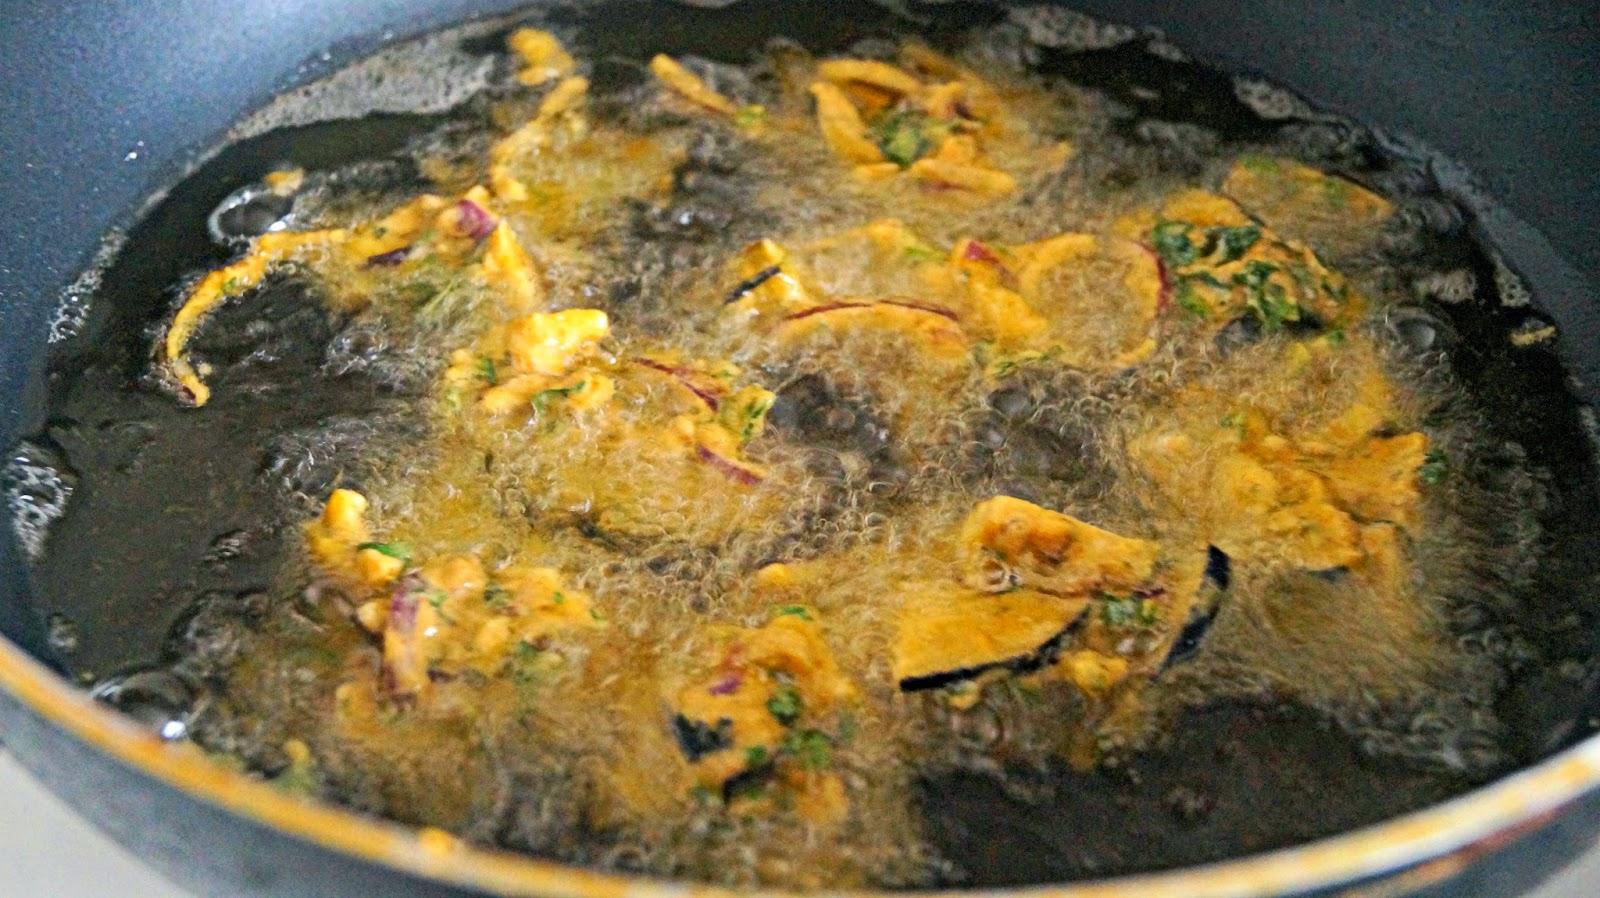 http://cupcakeluvs.blogspot.dk/2015/03/aubergine-fritter-aubergine-pakoreh.html